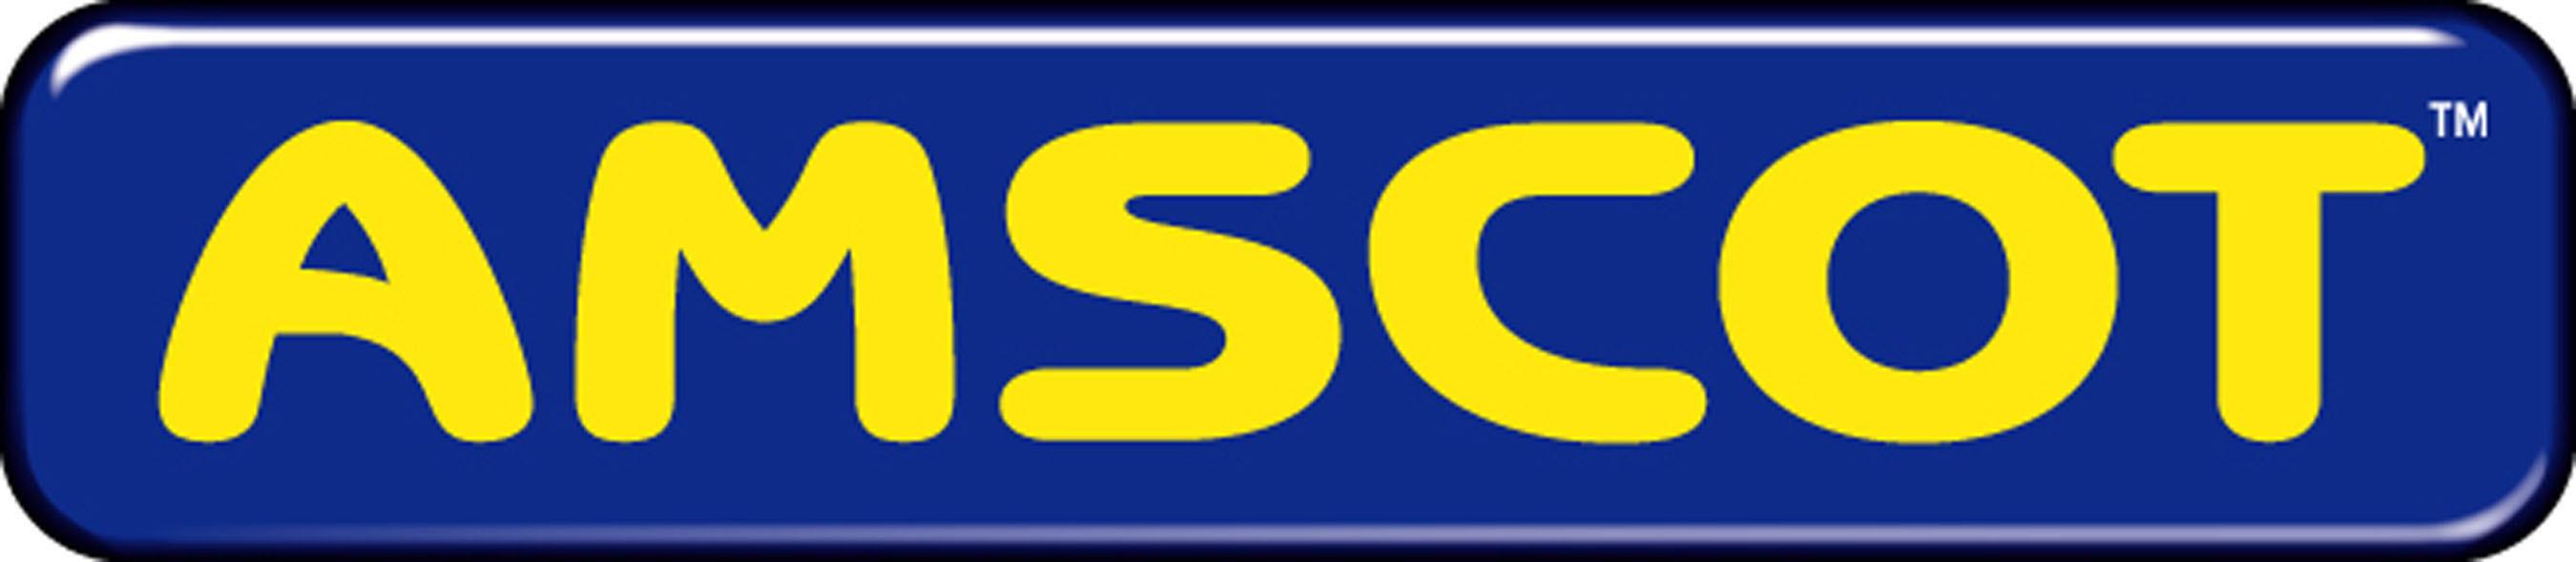 Amscot Financial logo.